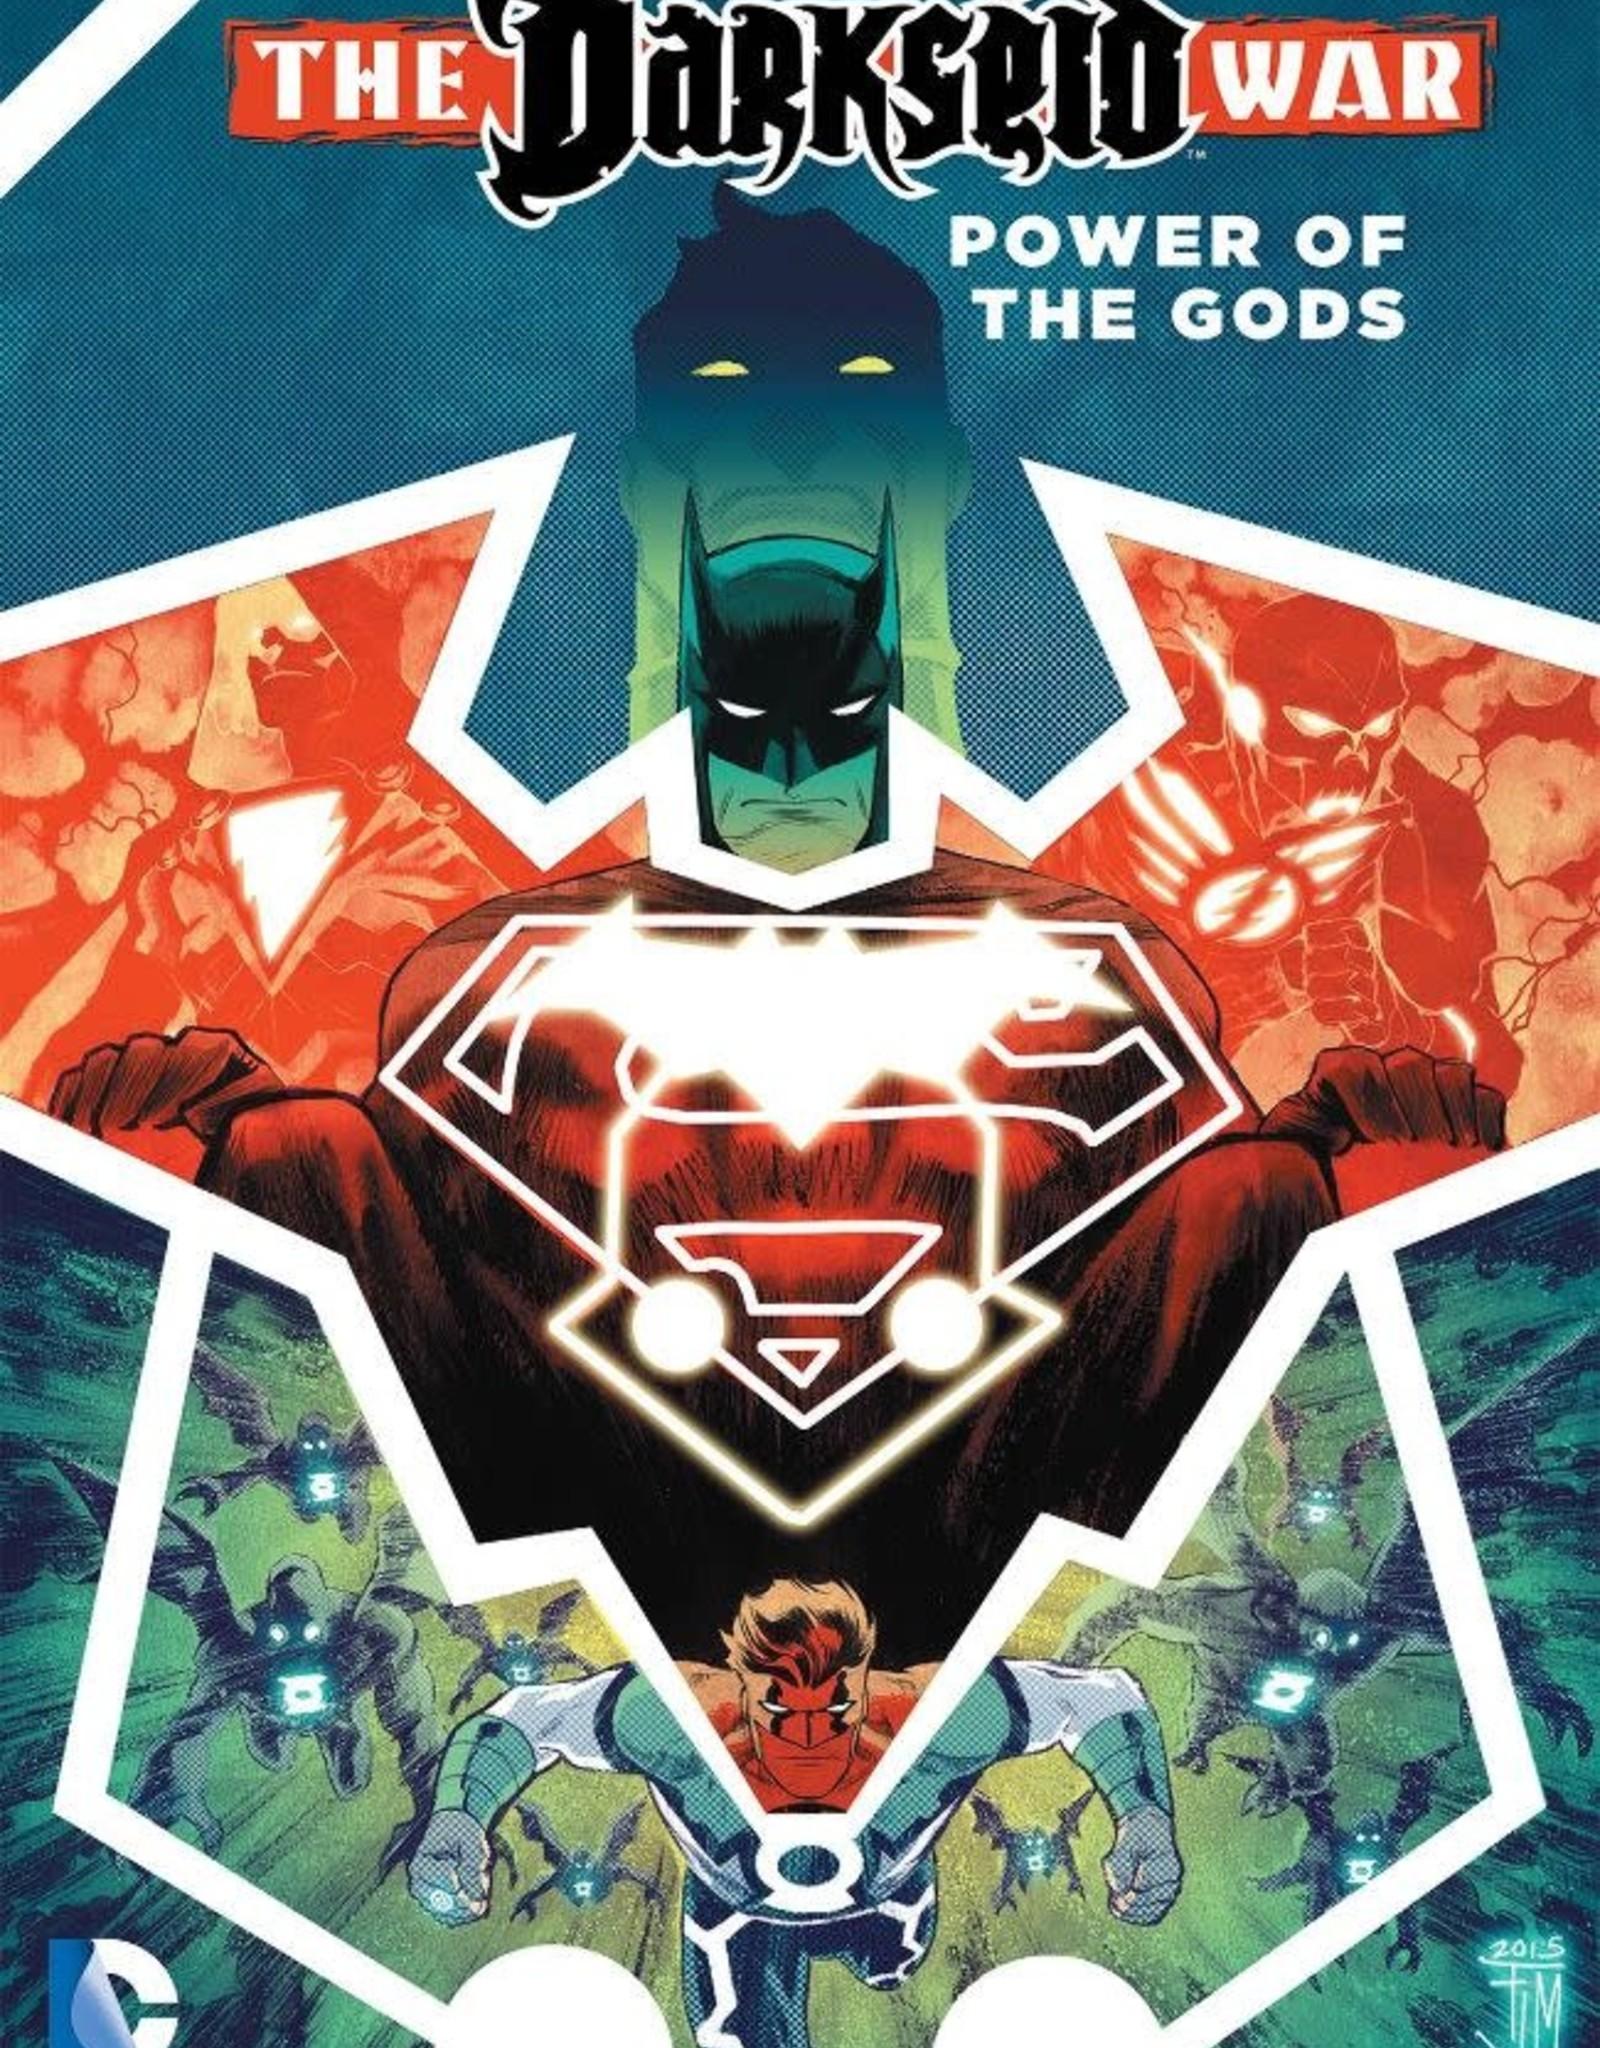 DC Comics Justice League Darkseid War Power of the Gods